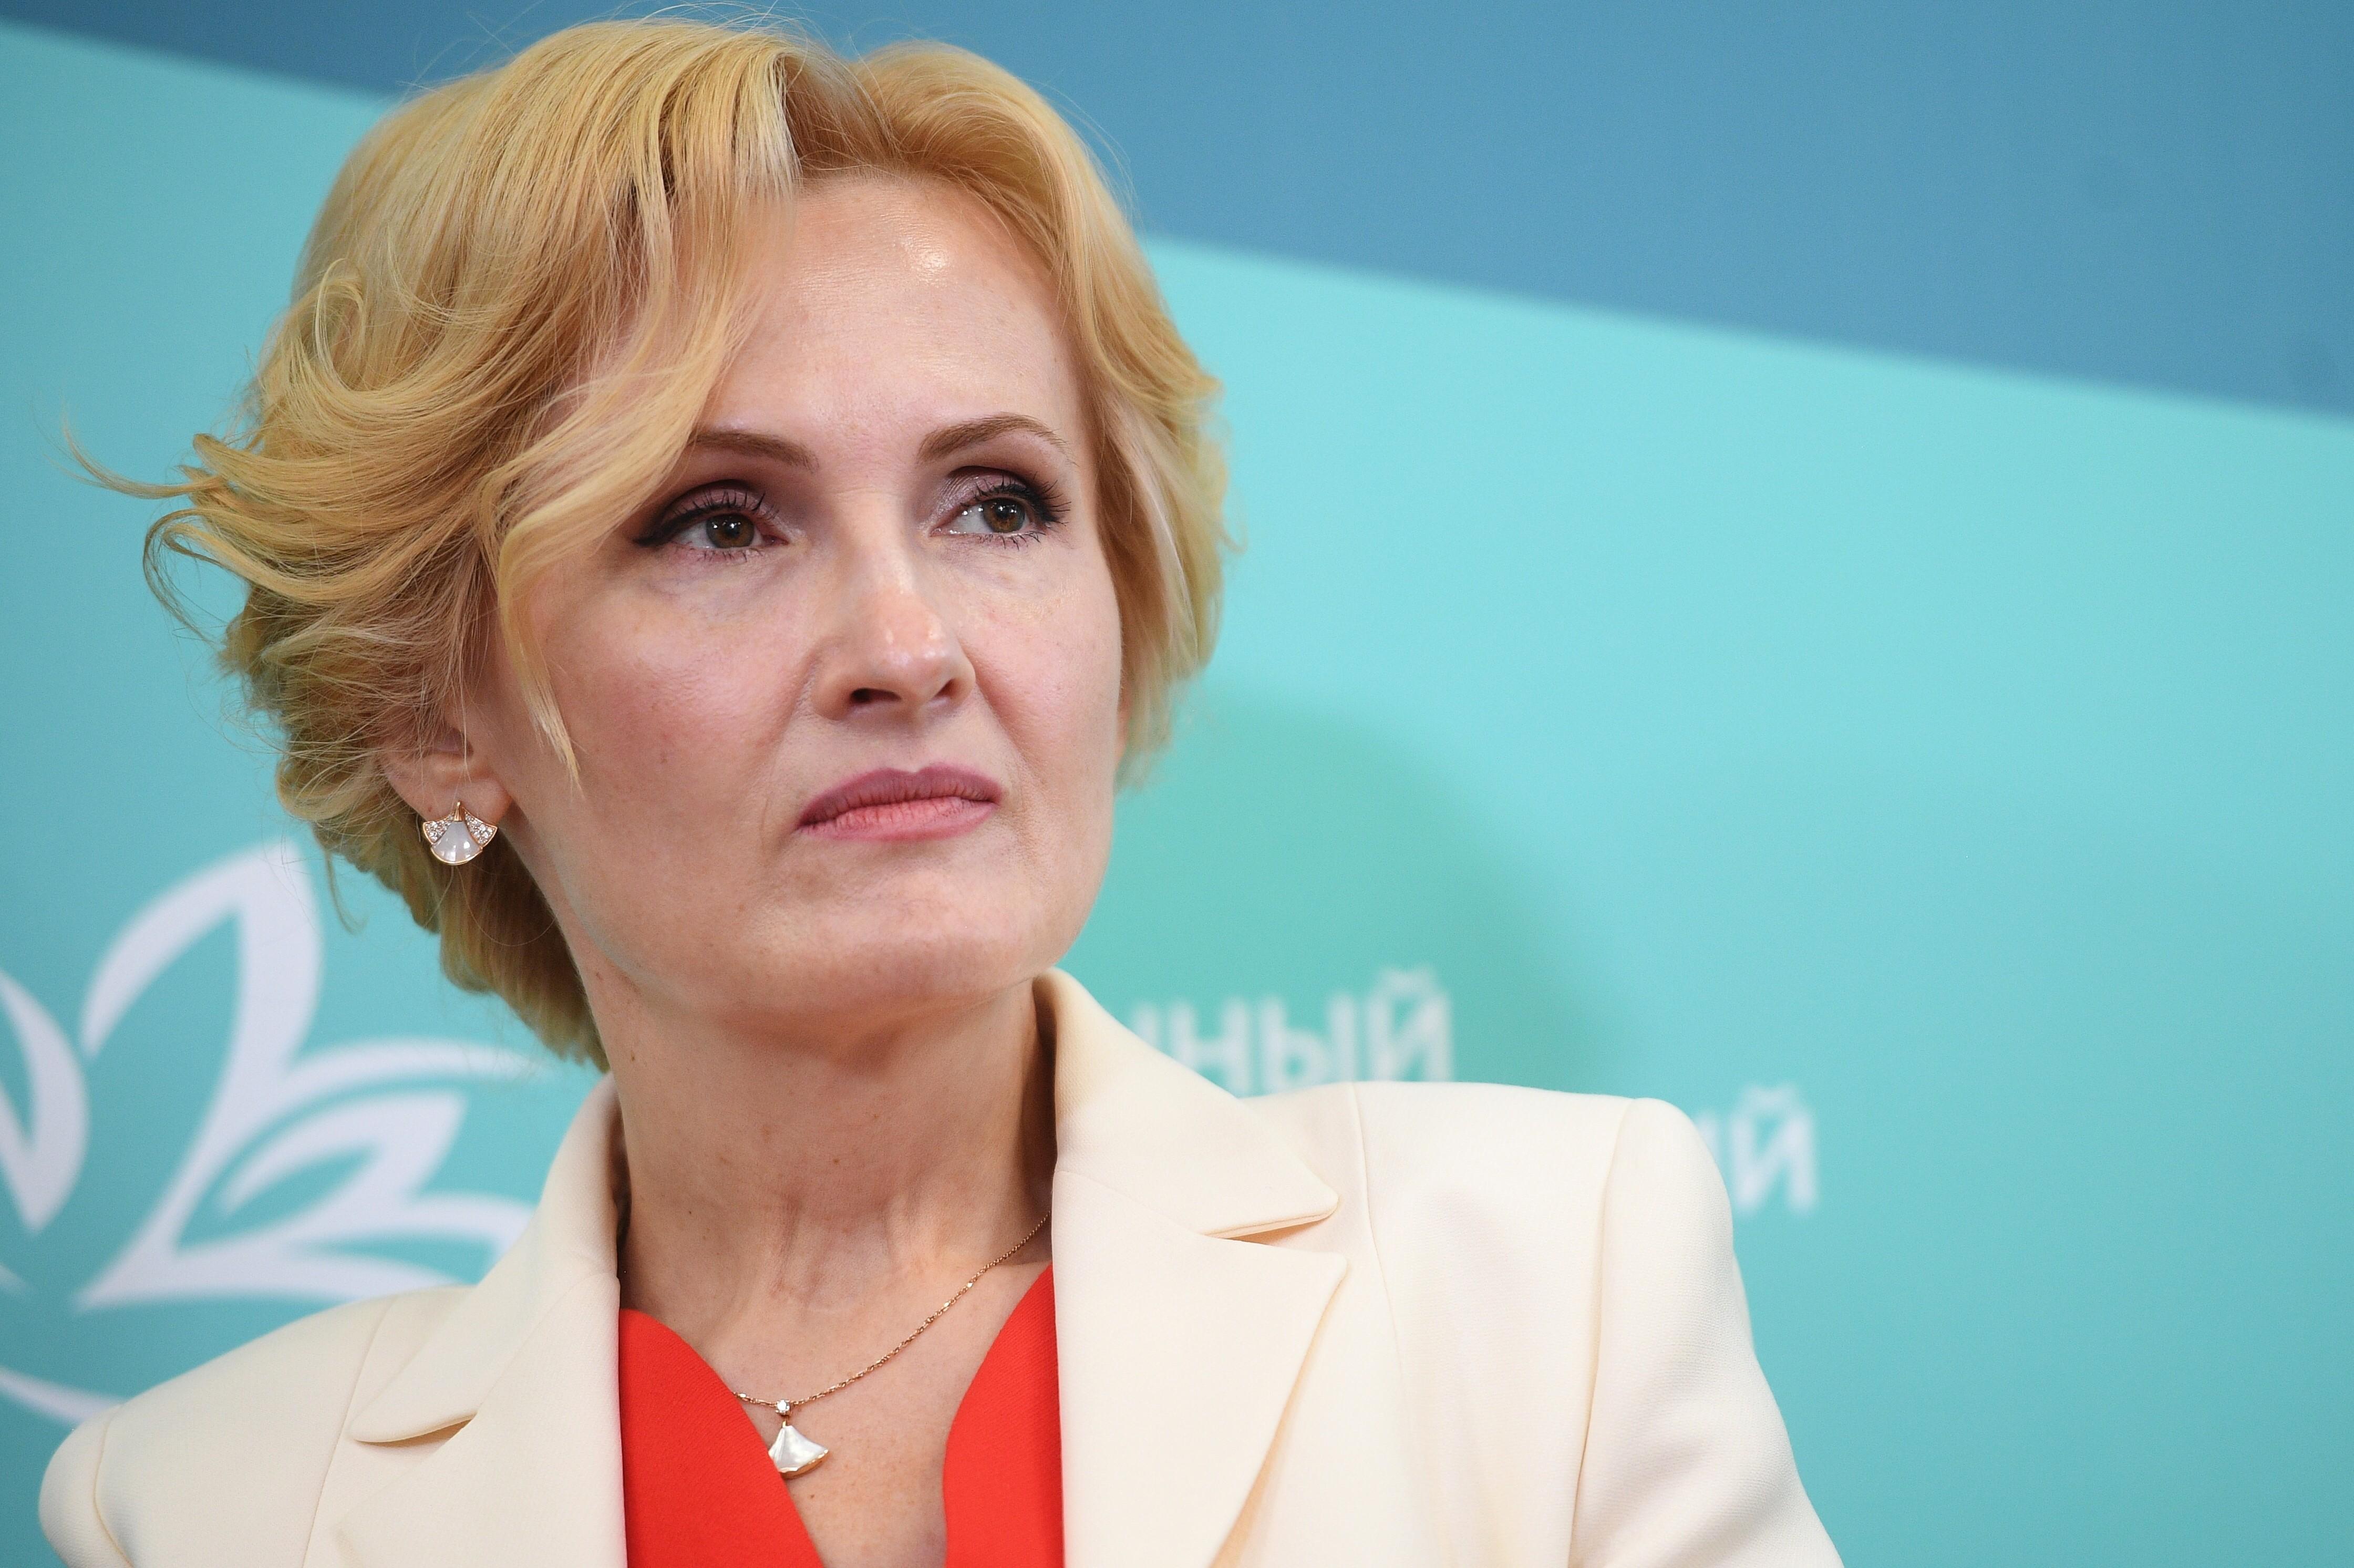 <p>Ирина Яровая. Фото: &copy; РИА Новости/Владимир Астапкович</p>